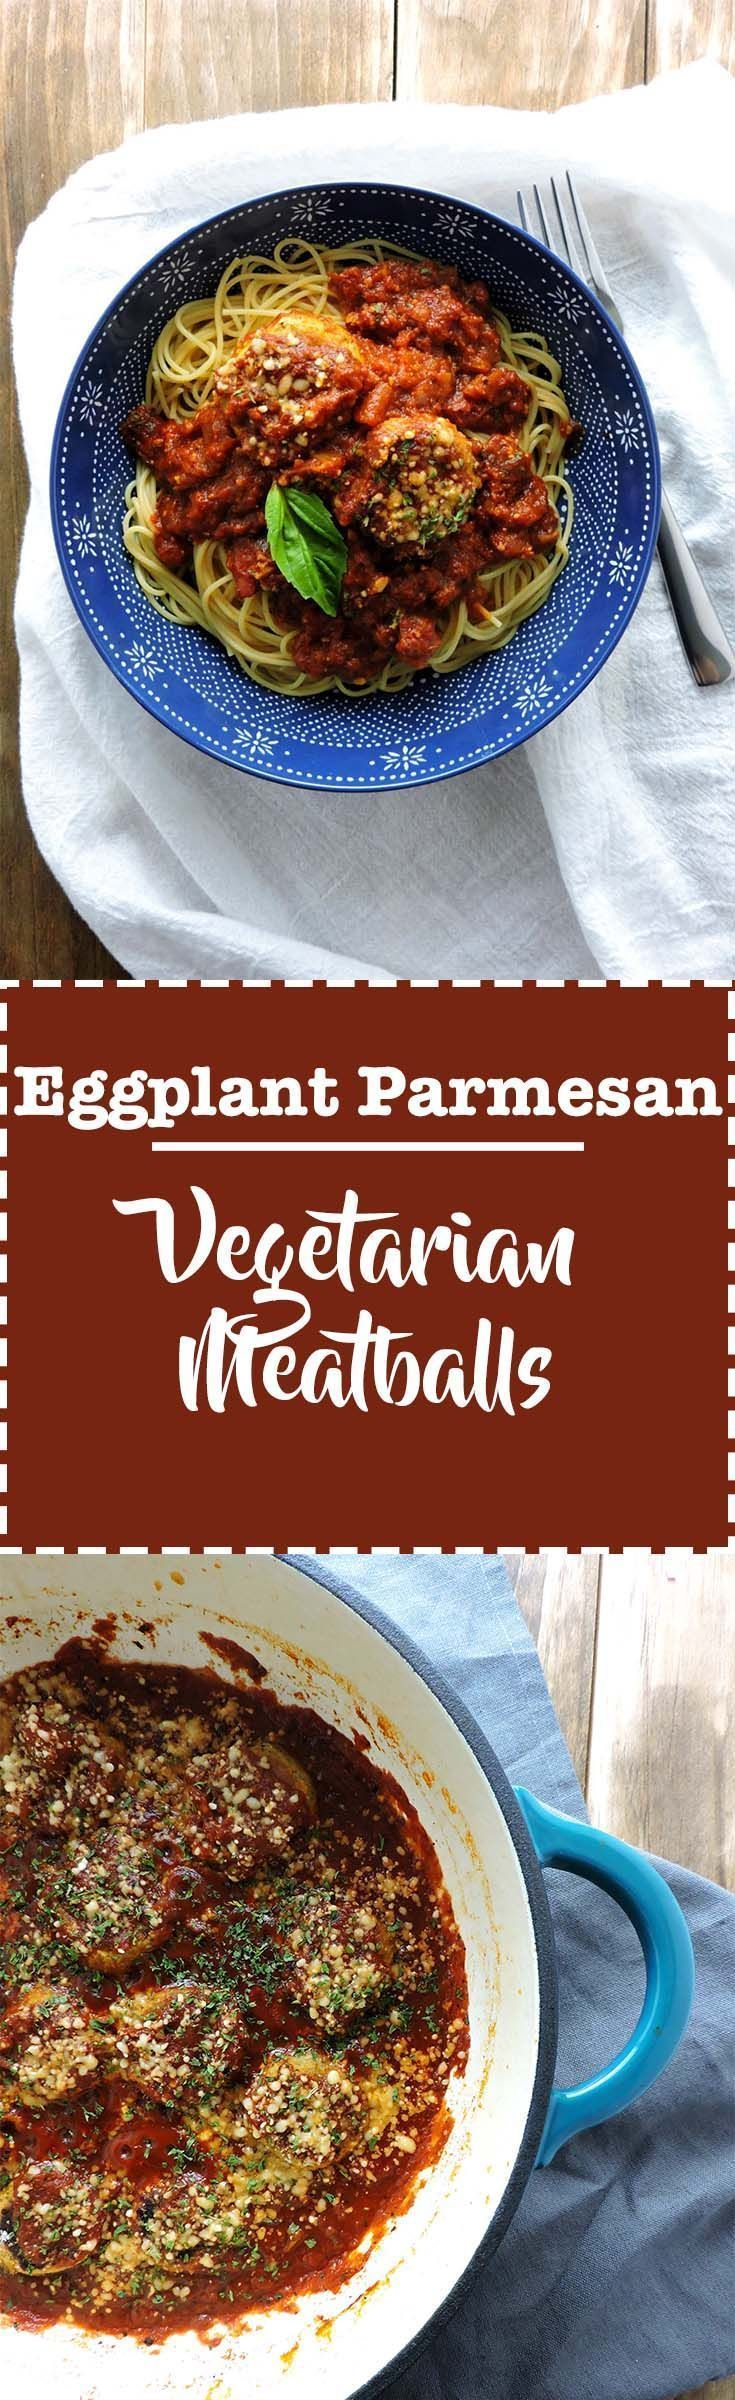 Eggplant Parmesan Meatballs